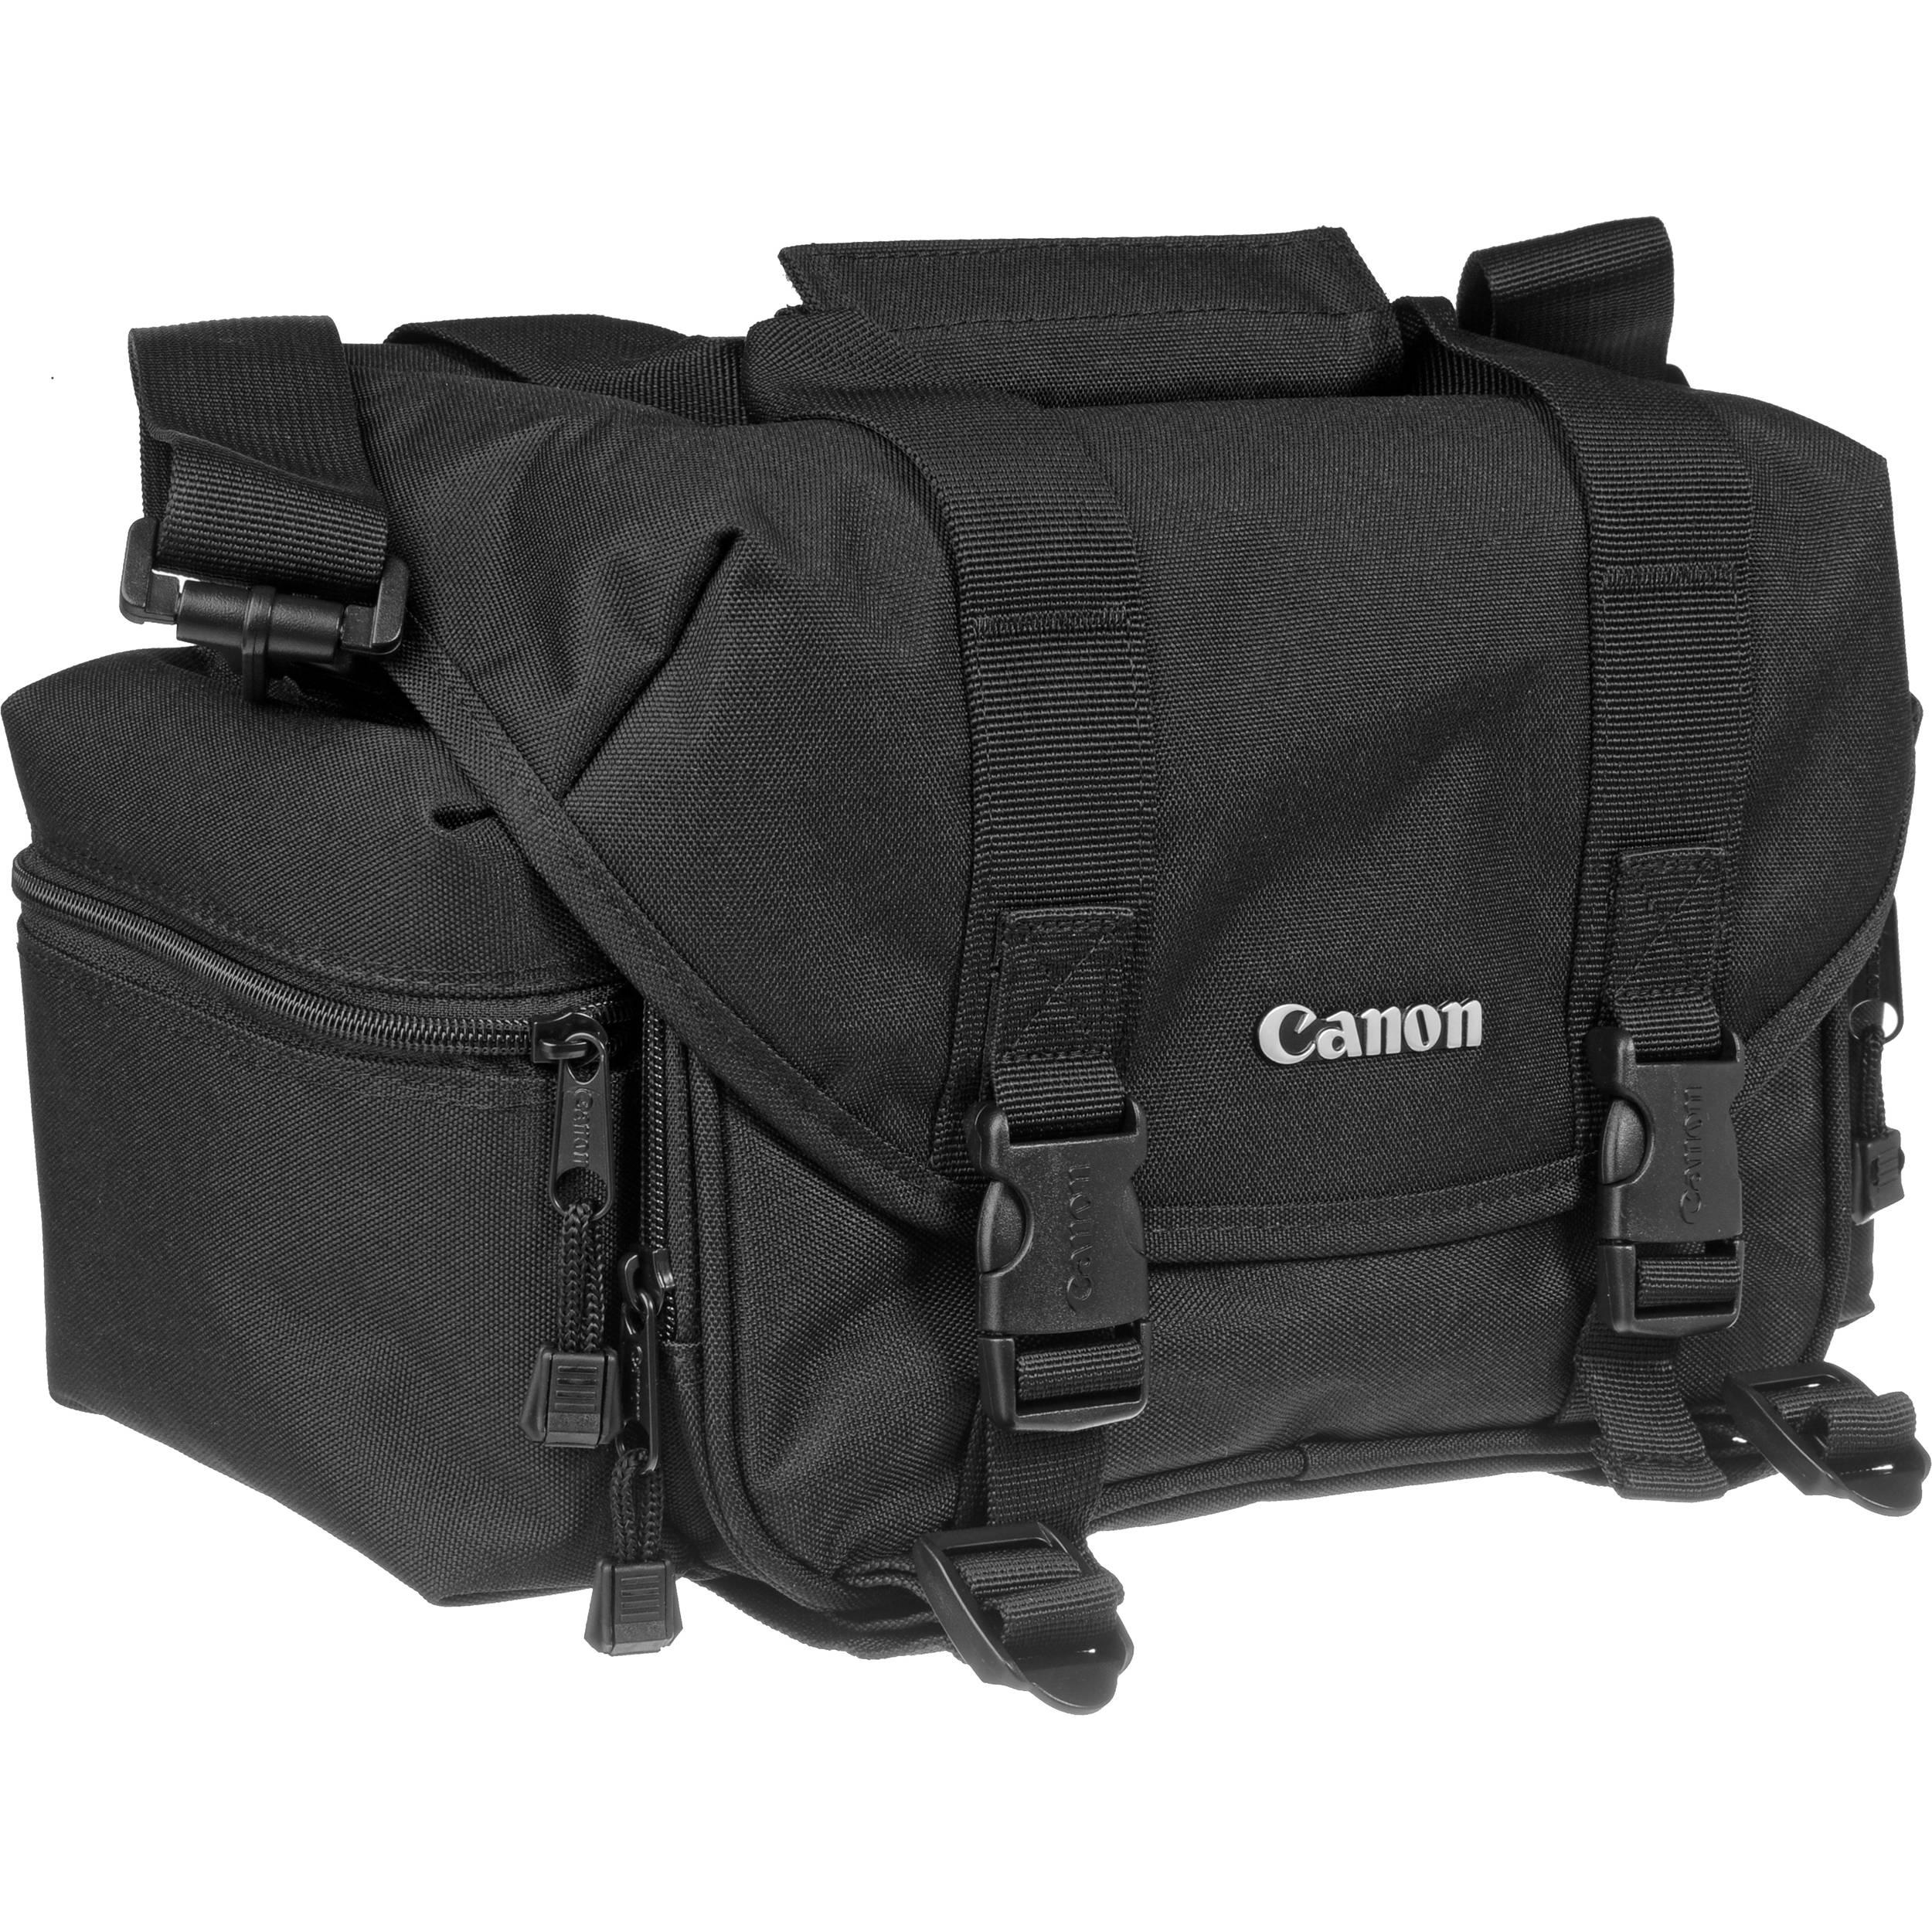 Canon Gadget Bag 2400 Black With Gray Interior